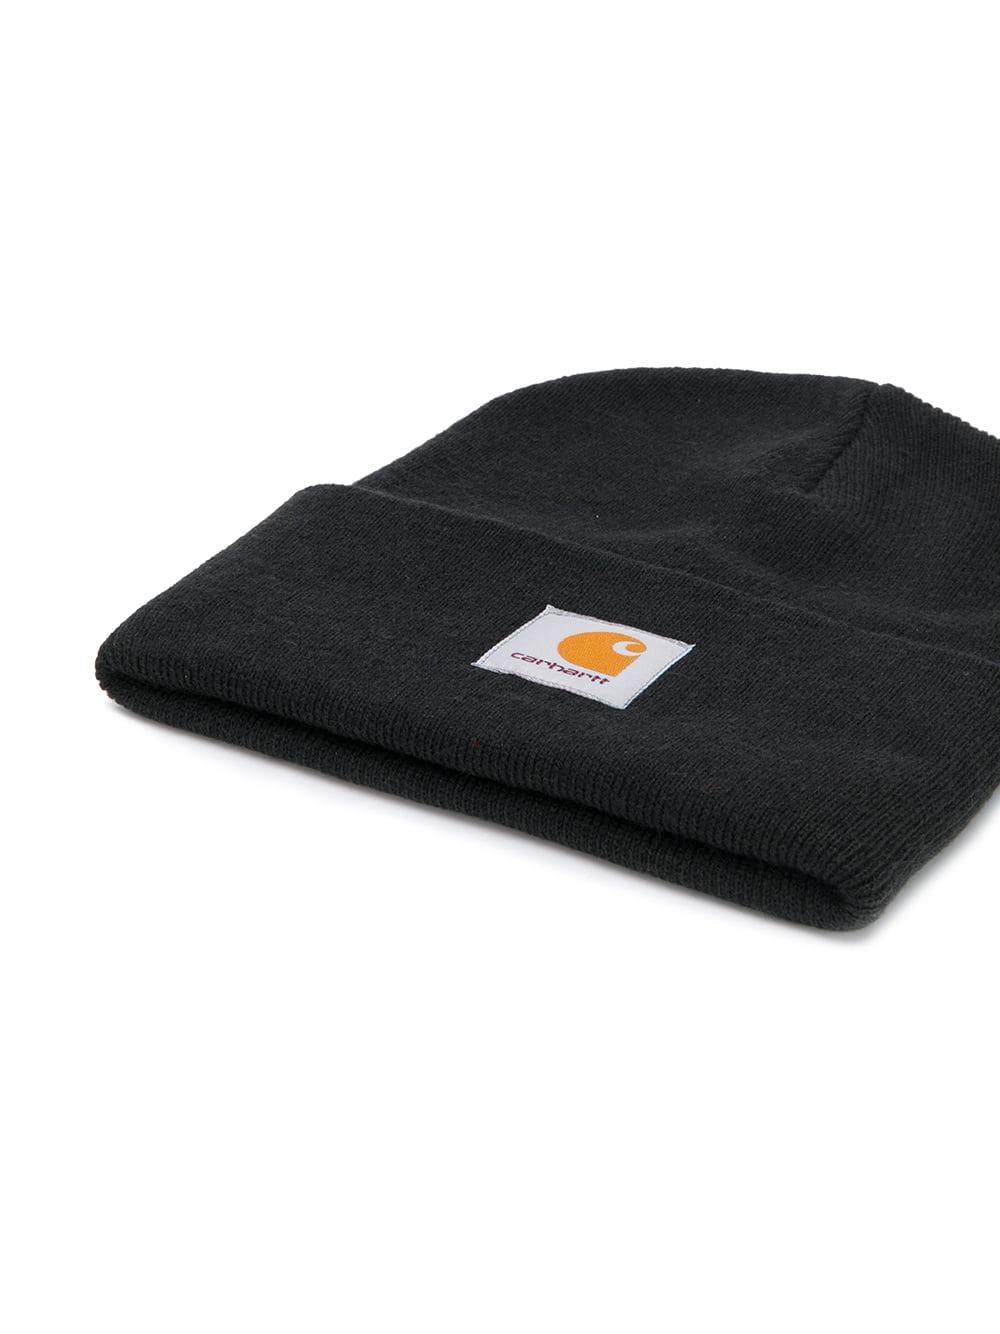 Carhartt Wip logo hat man black CARHARTT WIP | Hats | I02022289.00